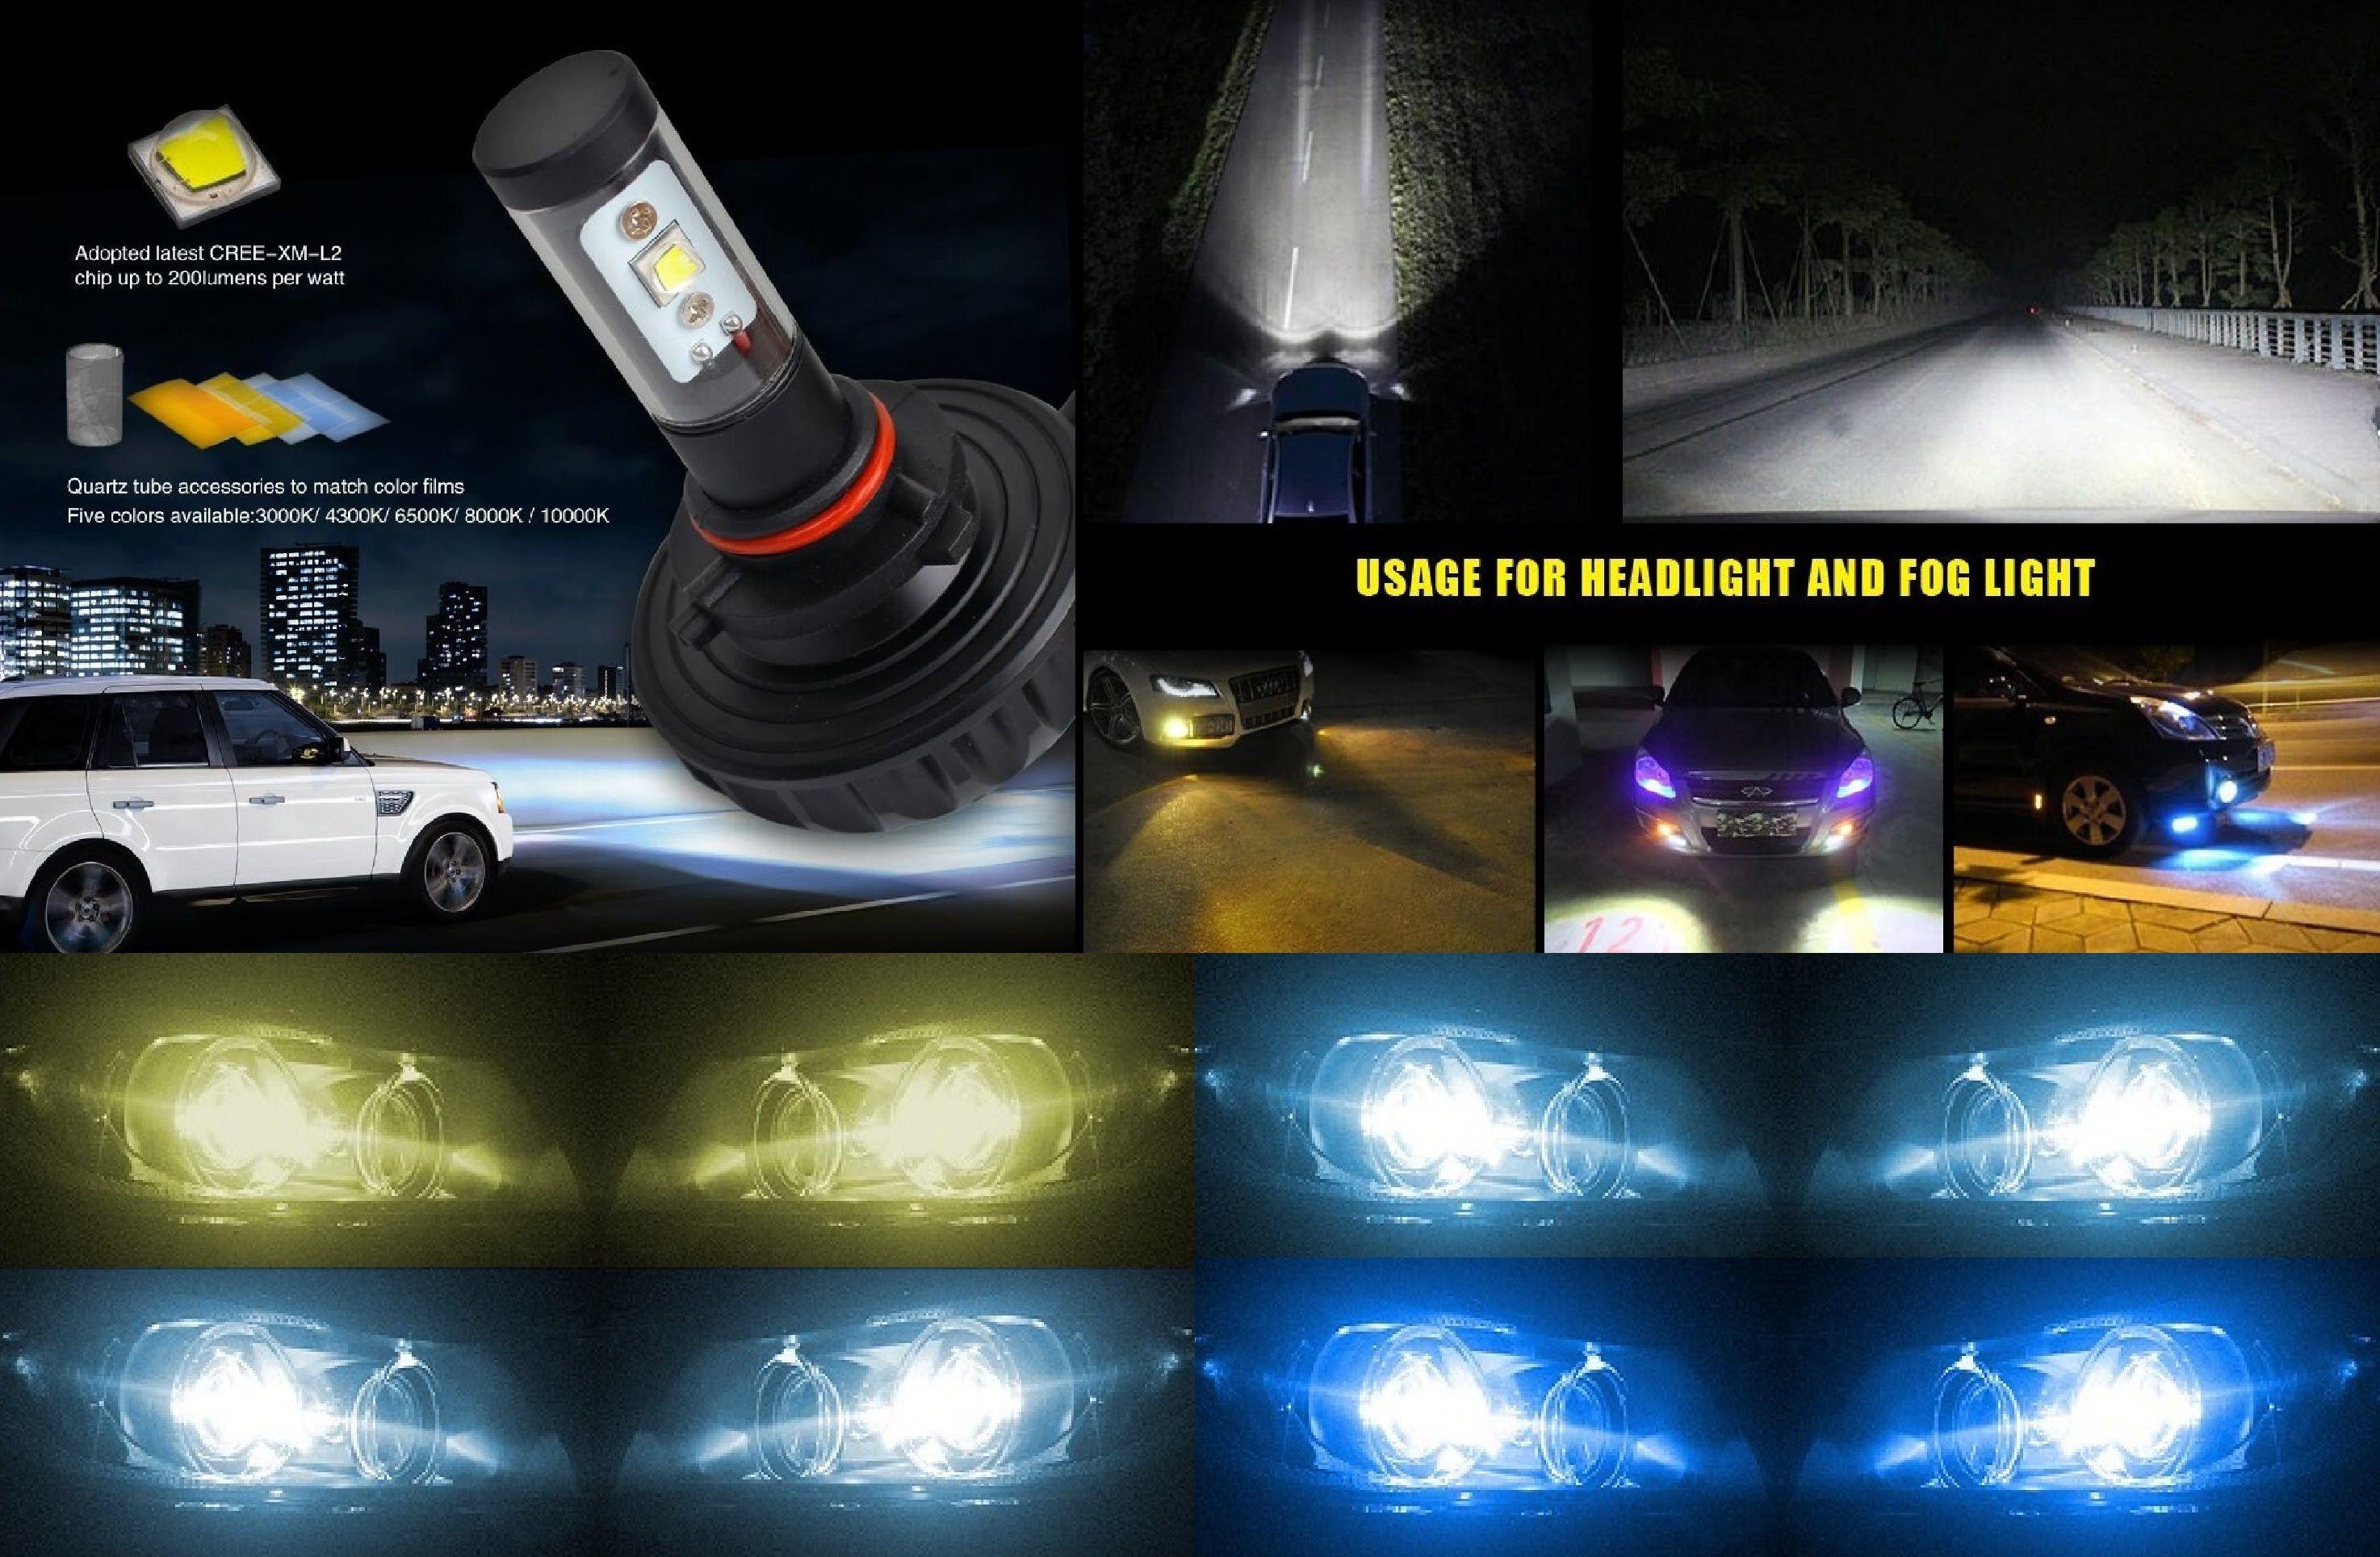 Led Bulb 3s Kit Head Light Fog 20w 4400 Lumen 30w 6000 Lumen Upgrade Replace Test Review Led Fog Lights Led Bulb Cree Led